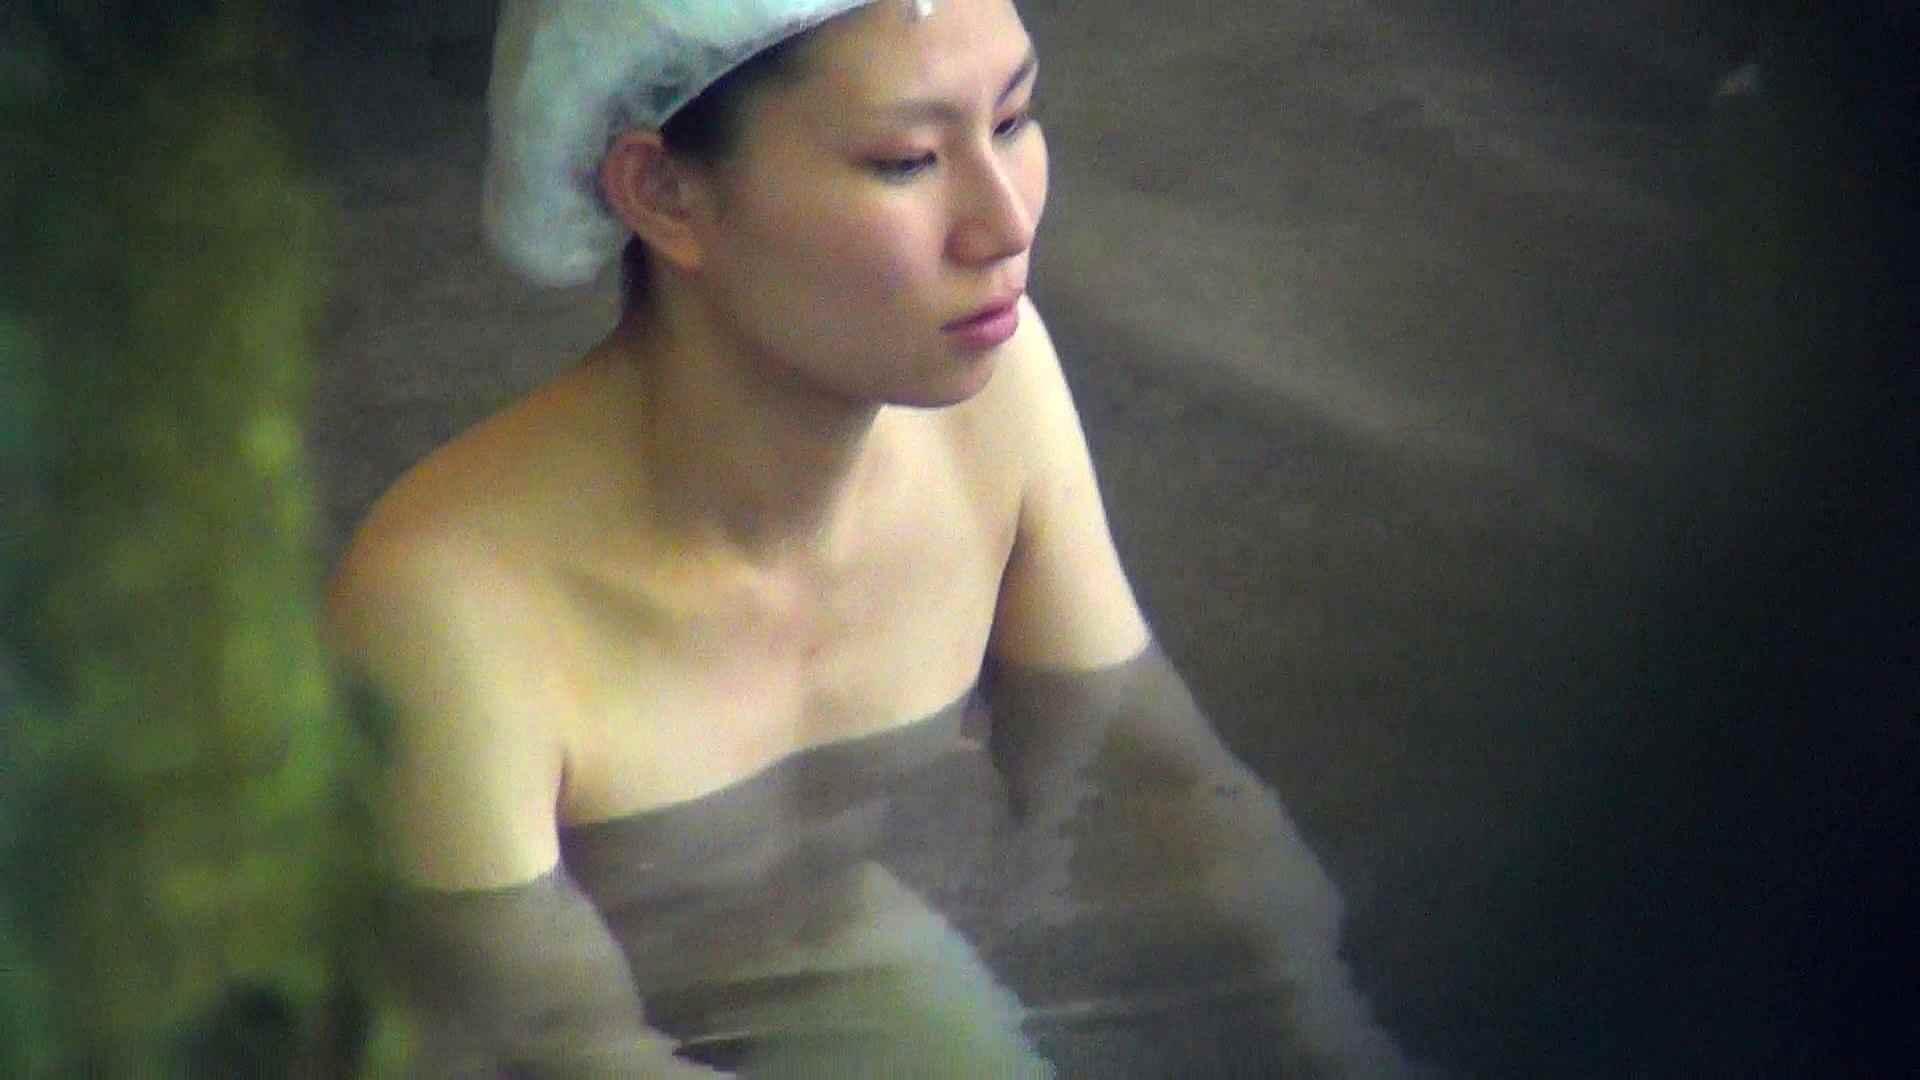 Aquaな露天風呂Vol.273 盗撮  105連発 51